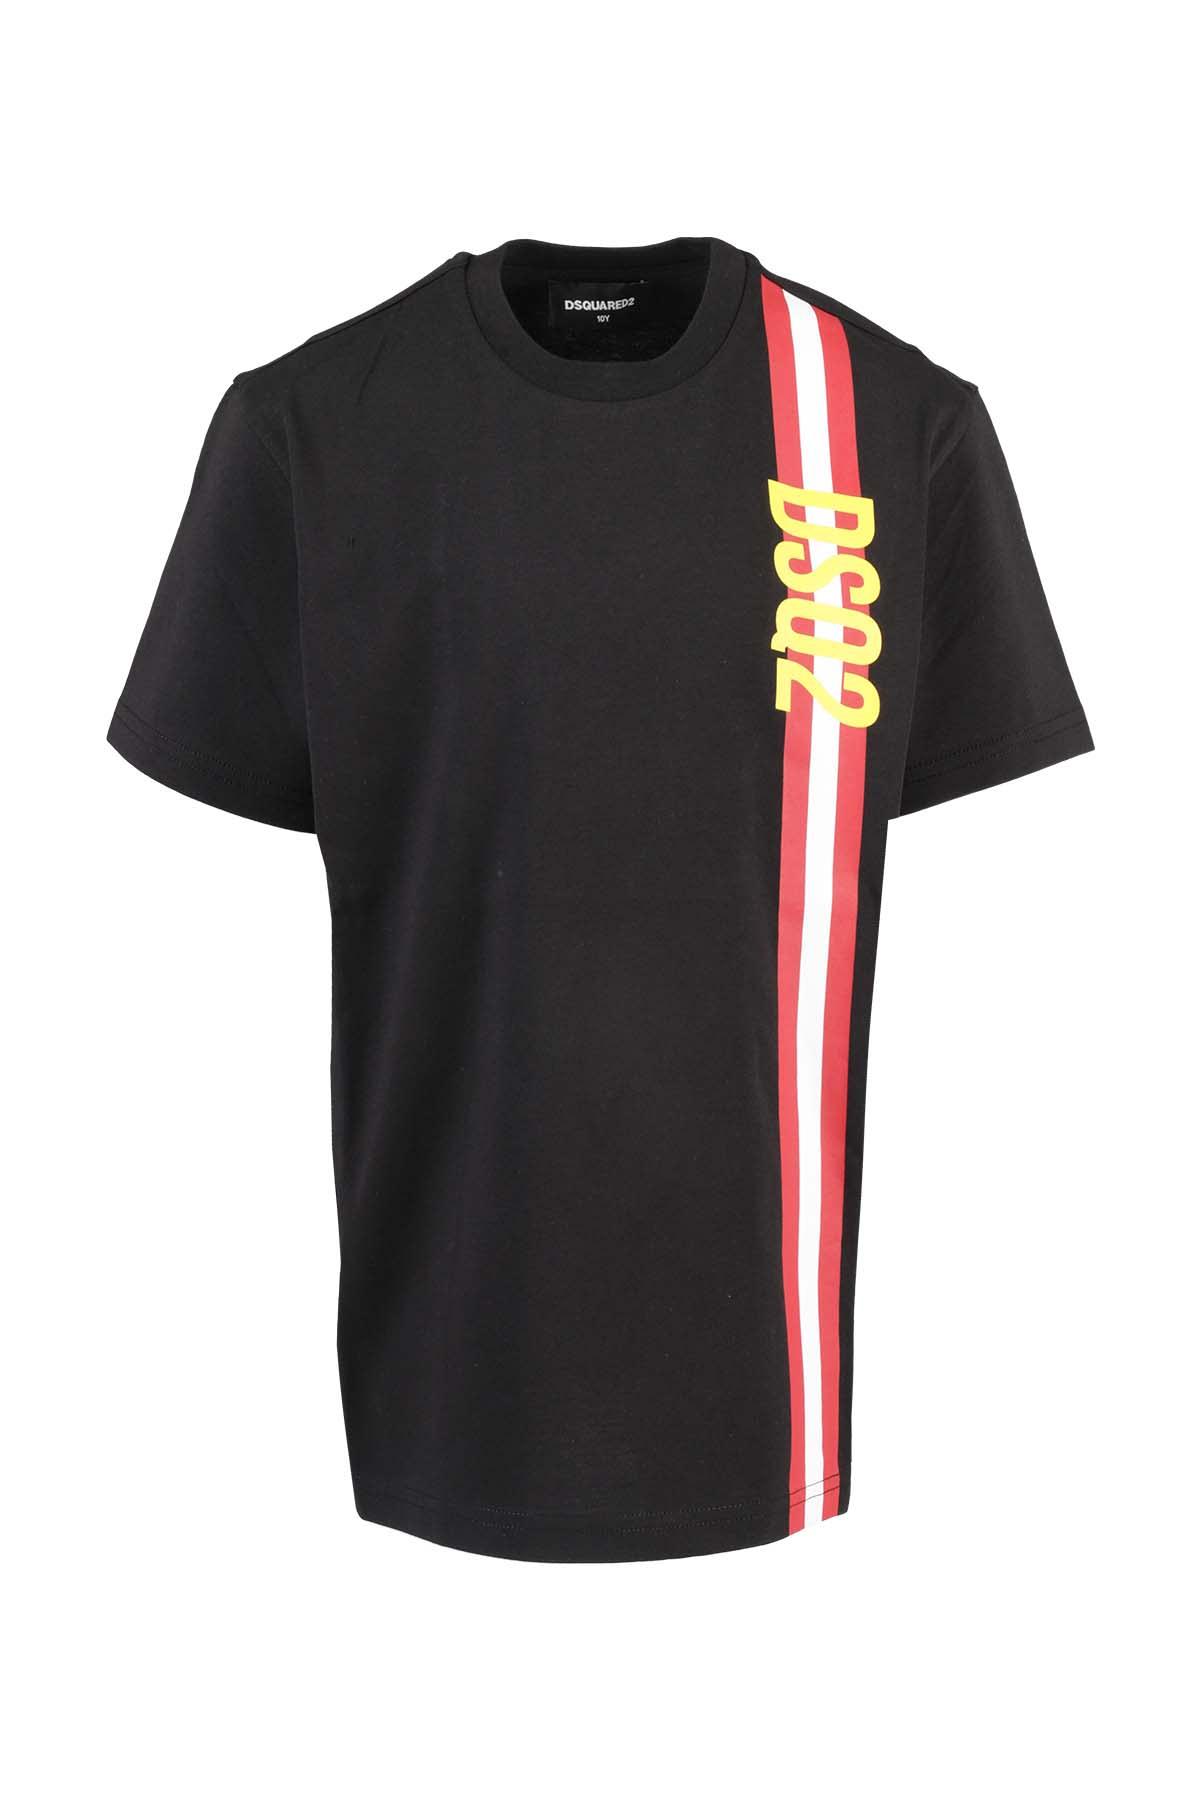 Dsquared2 Kids' Logo Band T-shirt In Nero